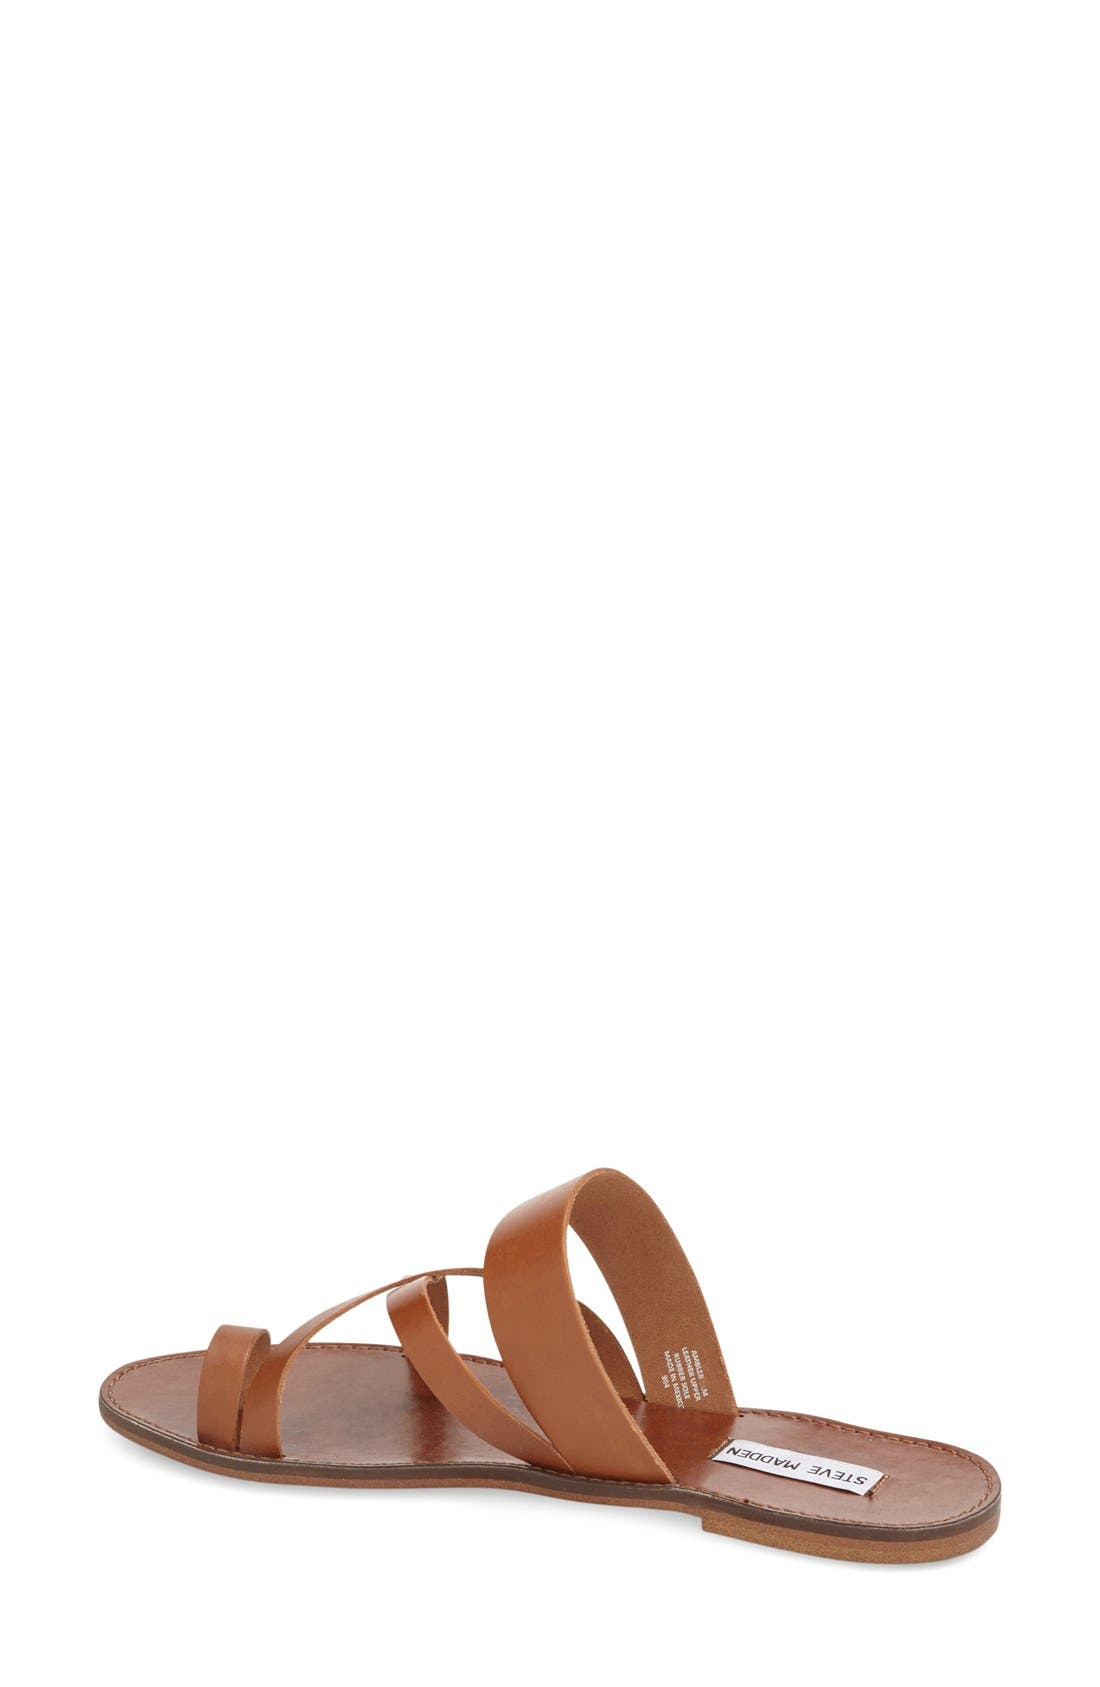 'Ambler' Sandal,                             Alternate thumbnail 2, color,                             Tan Leather